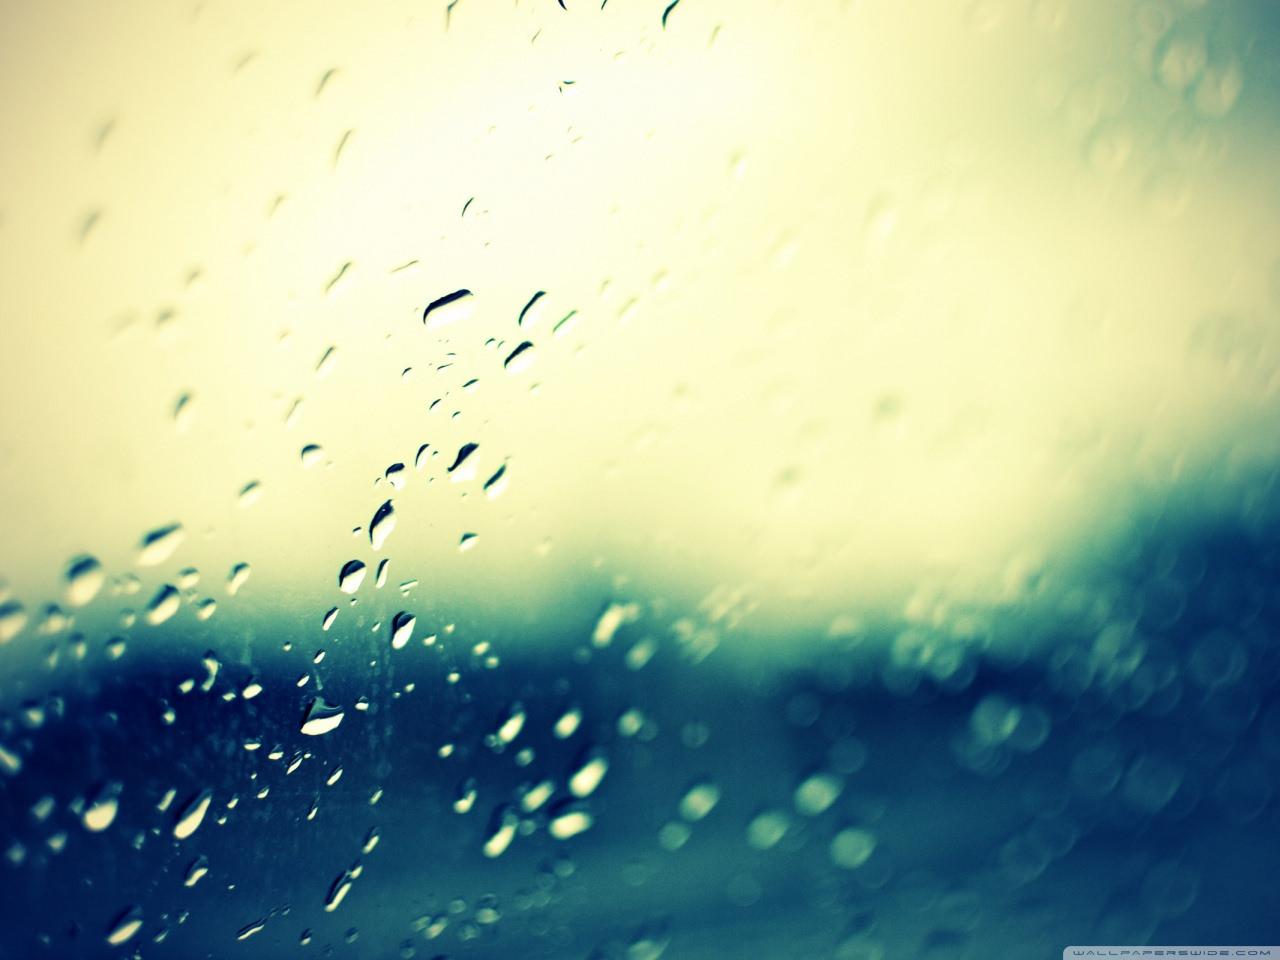 Water Drops Bokeh Wallpaper